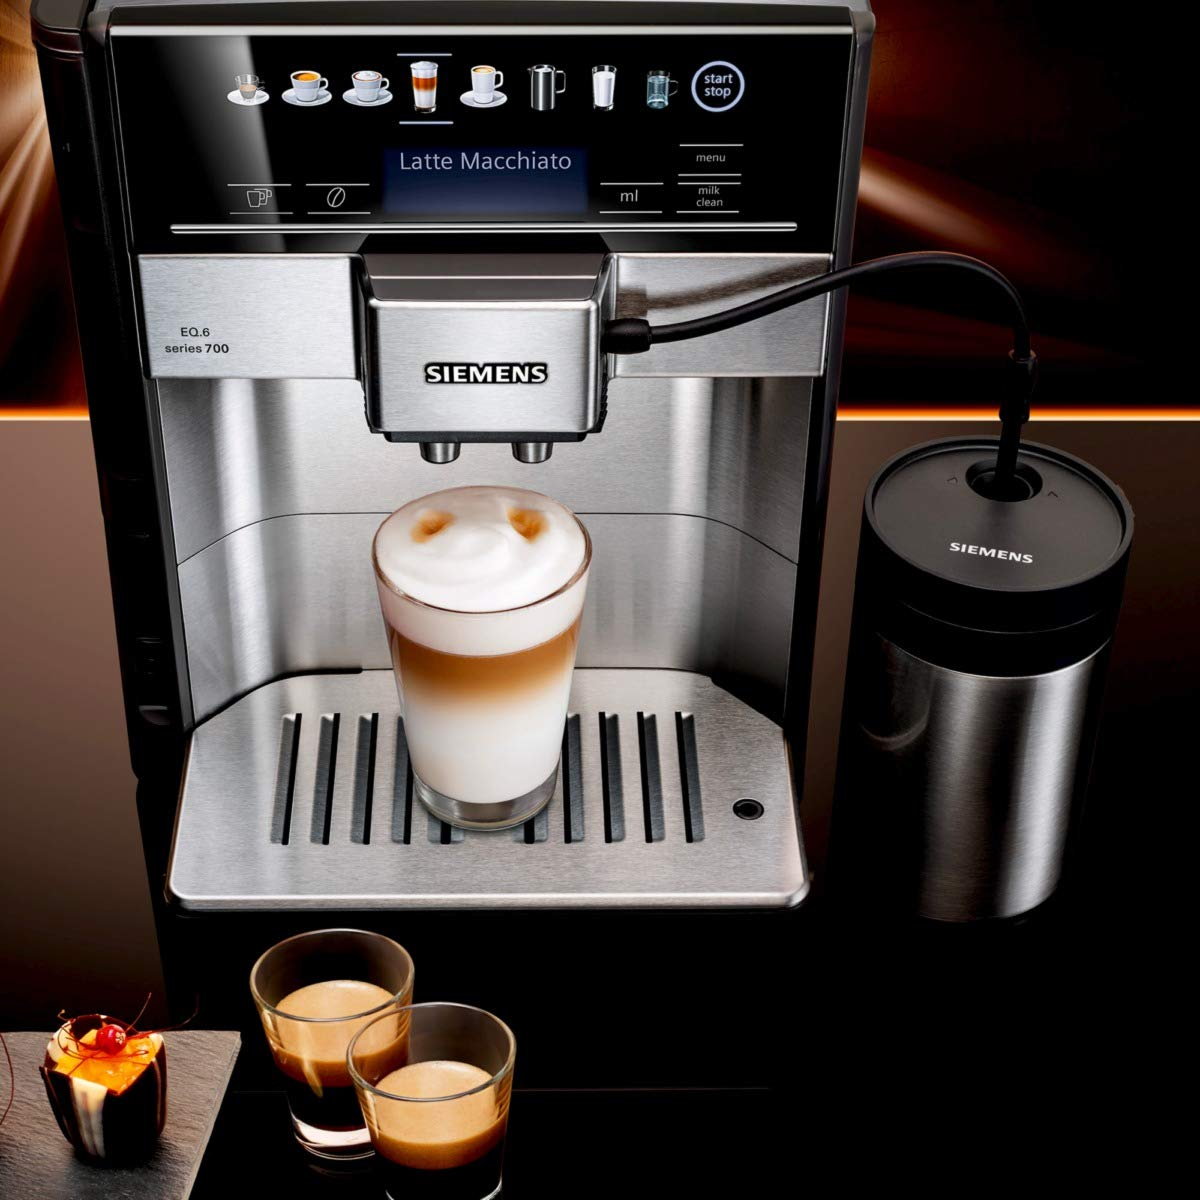 Die Besten Kaffeevollautomaten furs Buro